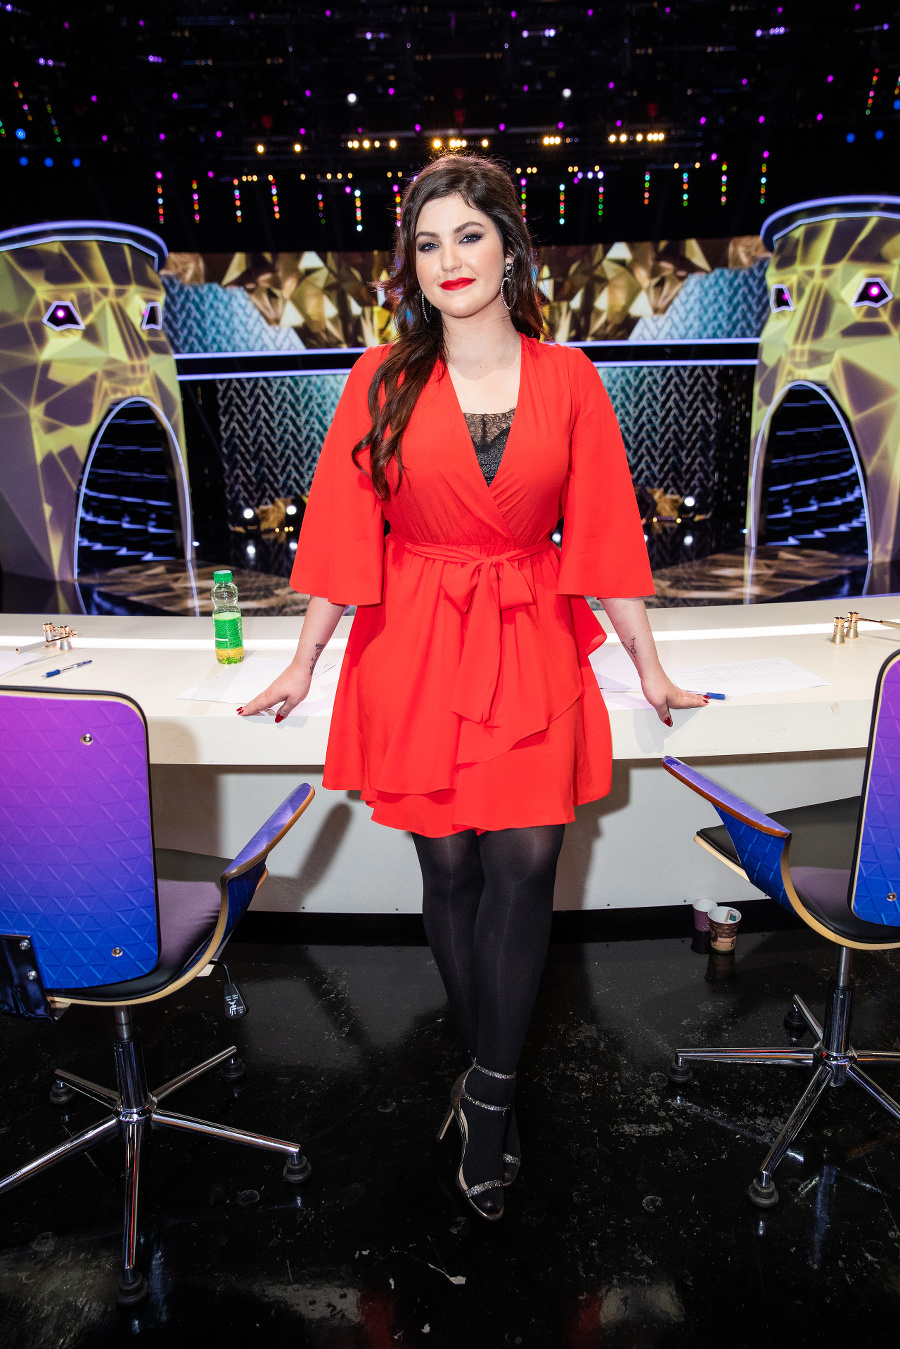 Speváčka Celeste Buckingham